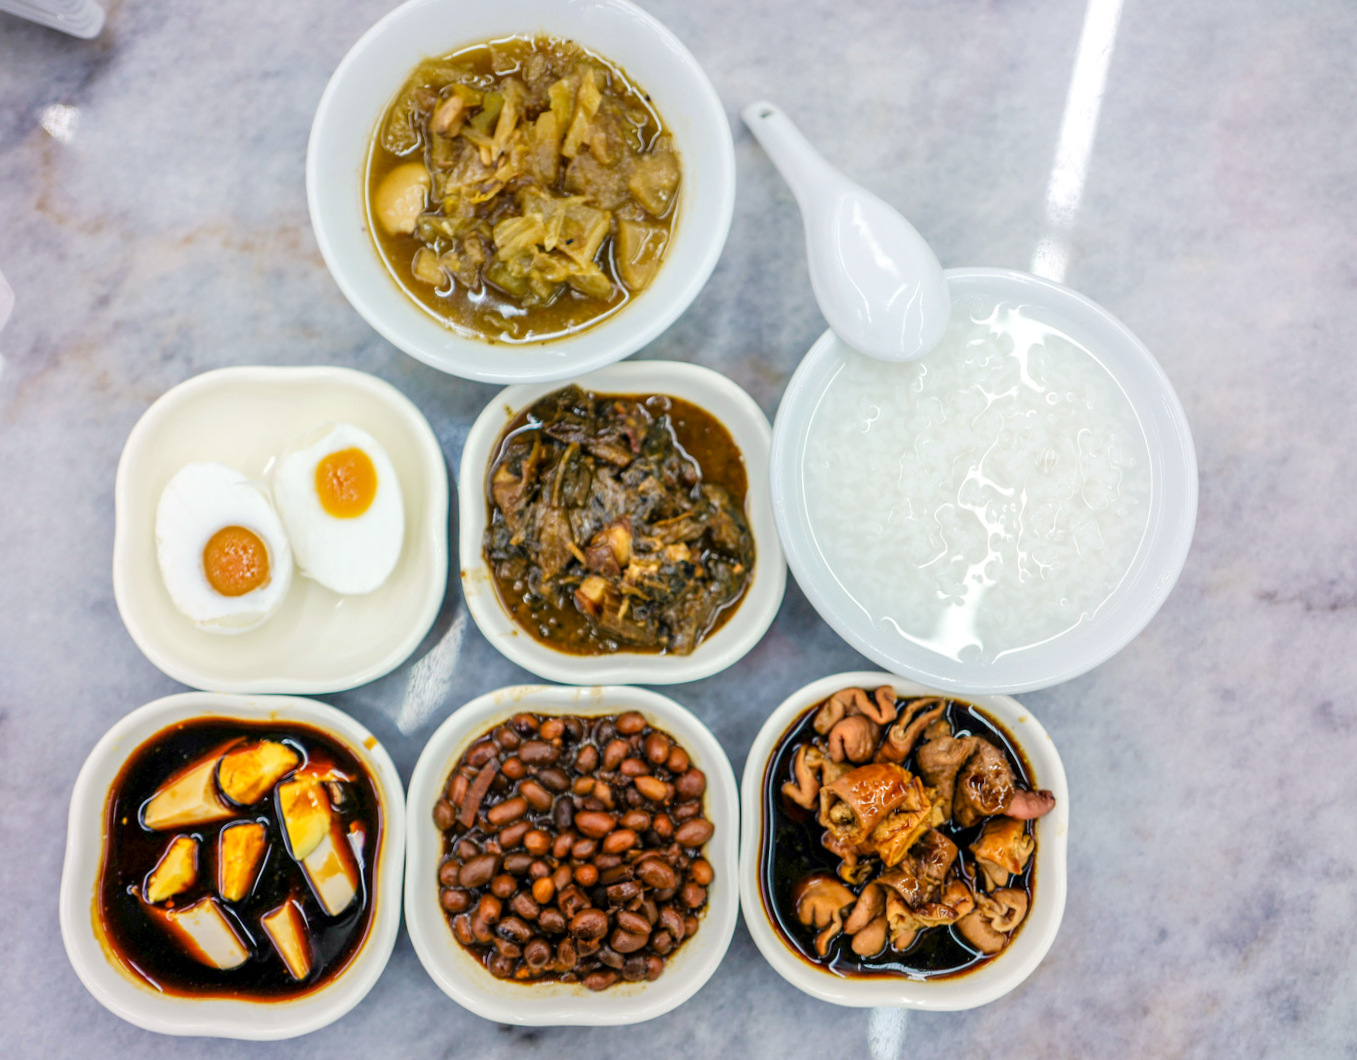 xing fu teo chew porridge @ solaris mont kiara